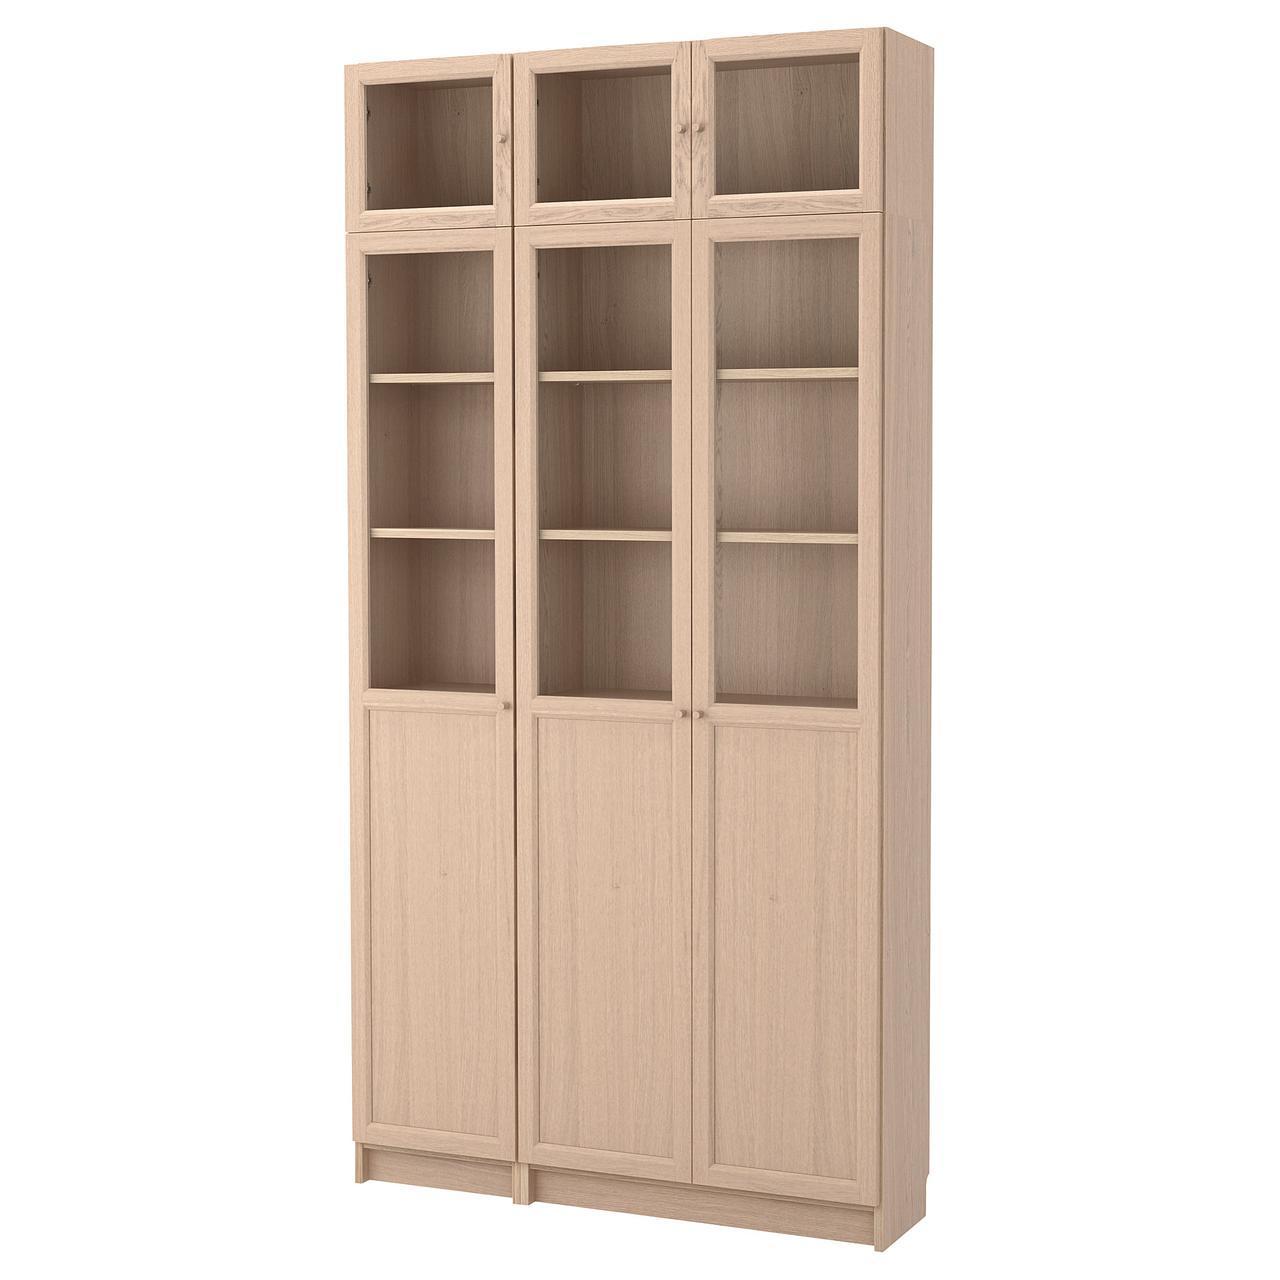 IKEA BILLY / OXBERG (792.499.60) Шкаф/Сервант, черно-белый